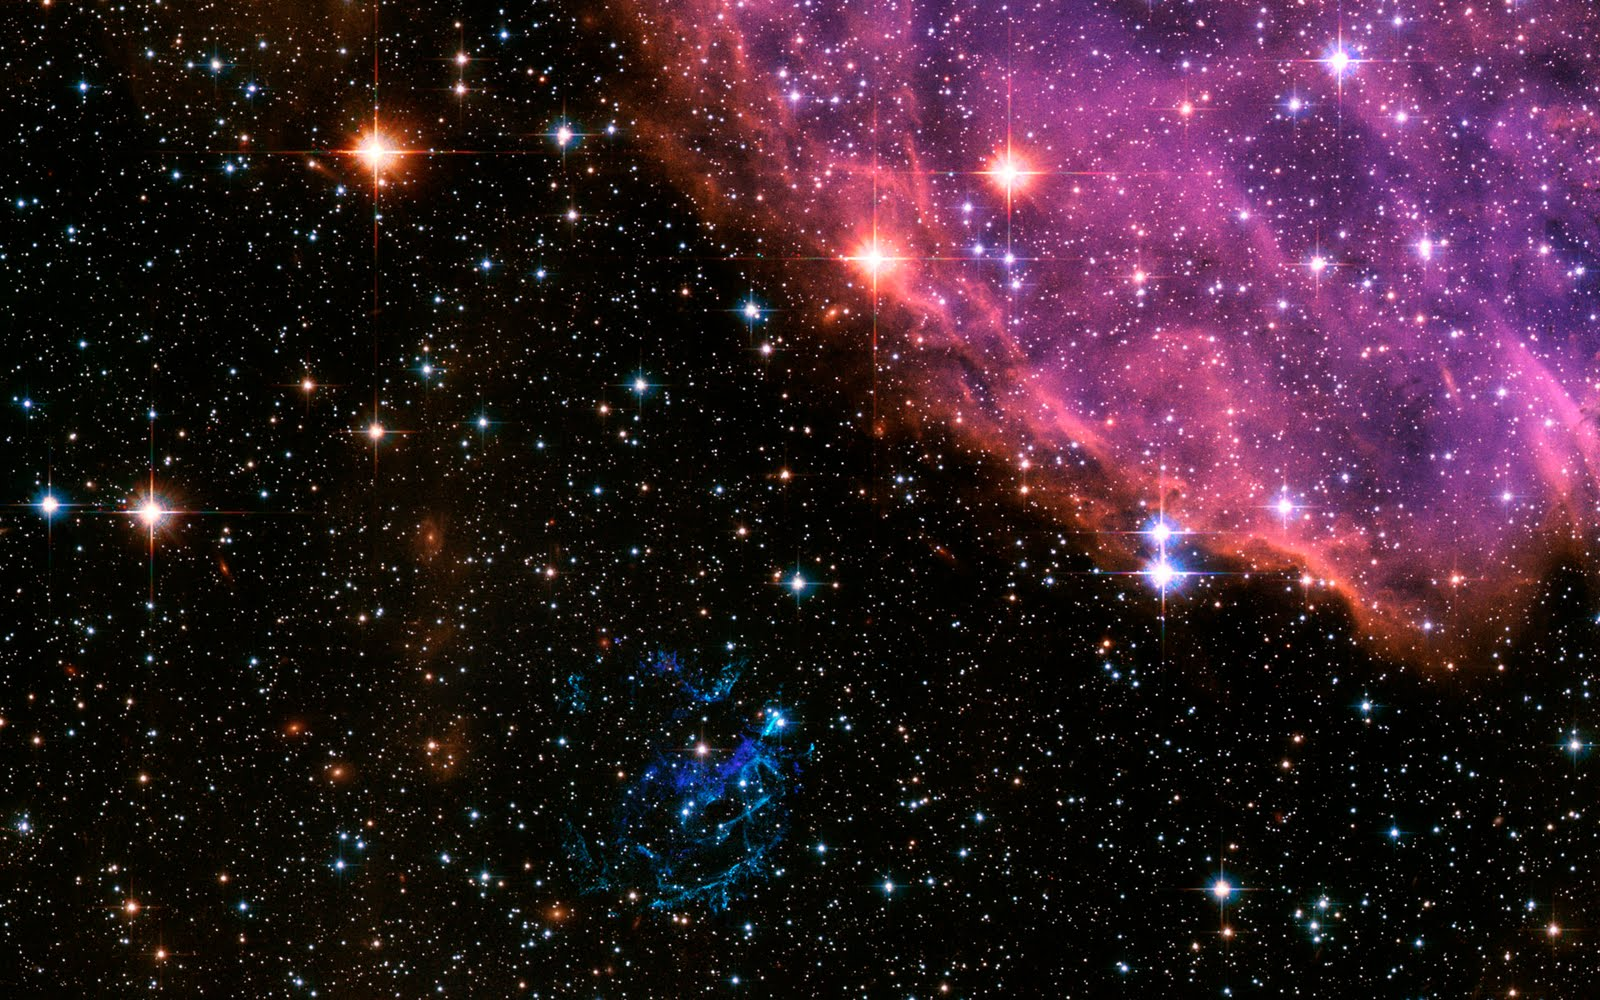 http://2.bp.blogspot.com/_yyVE9ThU7uM/TJUtldDpQHI/AAAAAAAAAVI/xZZZ_f8KKl4/s1600/Hubble_Telescope_Wallpapers39.jpg